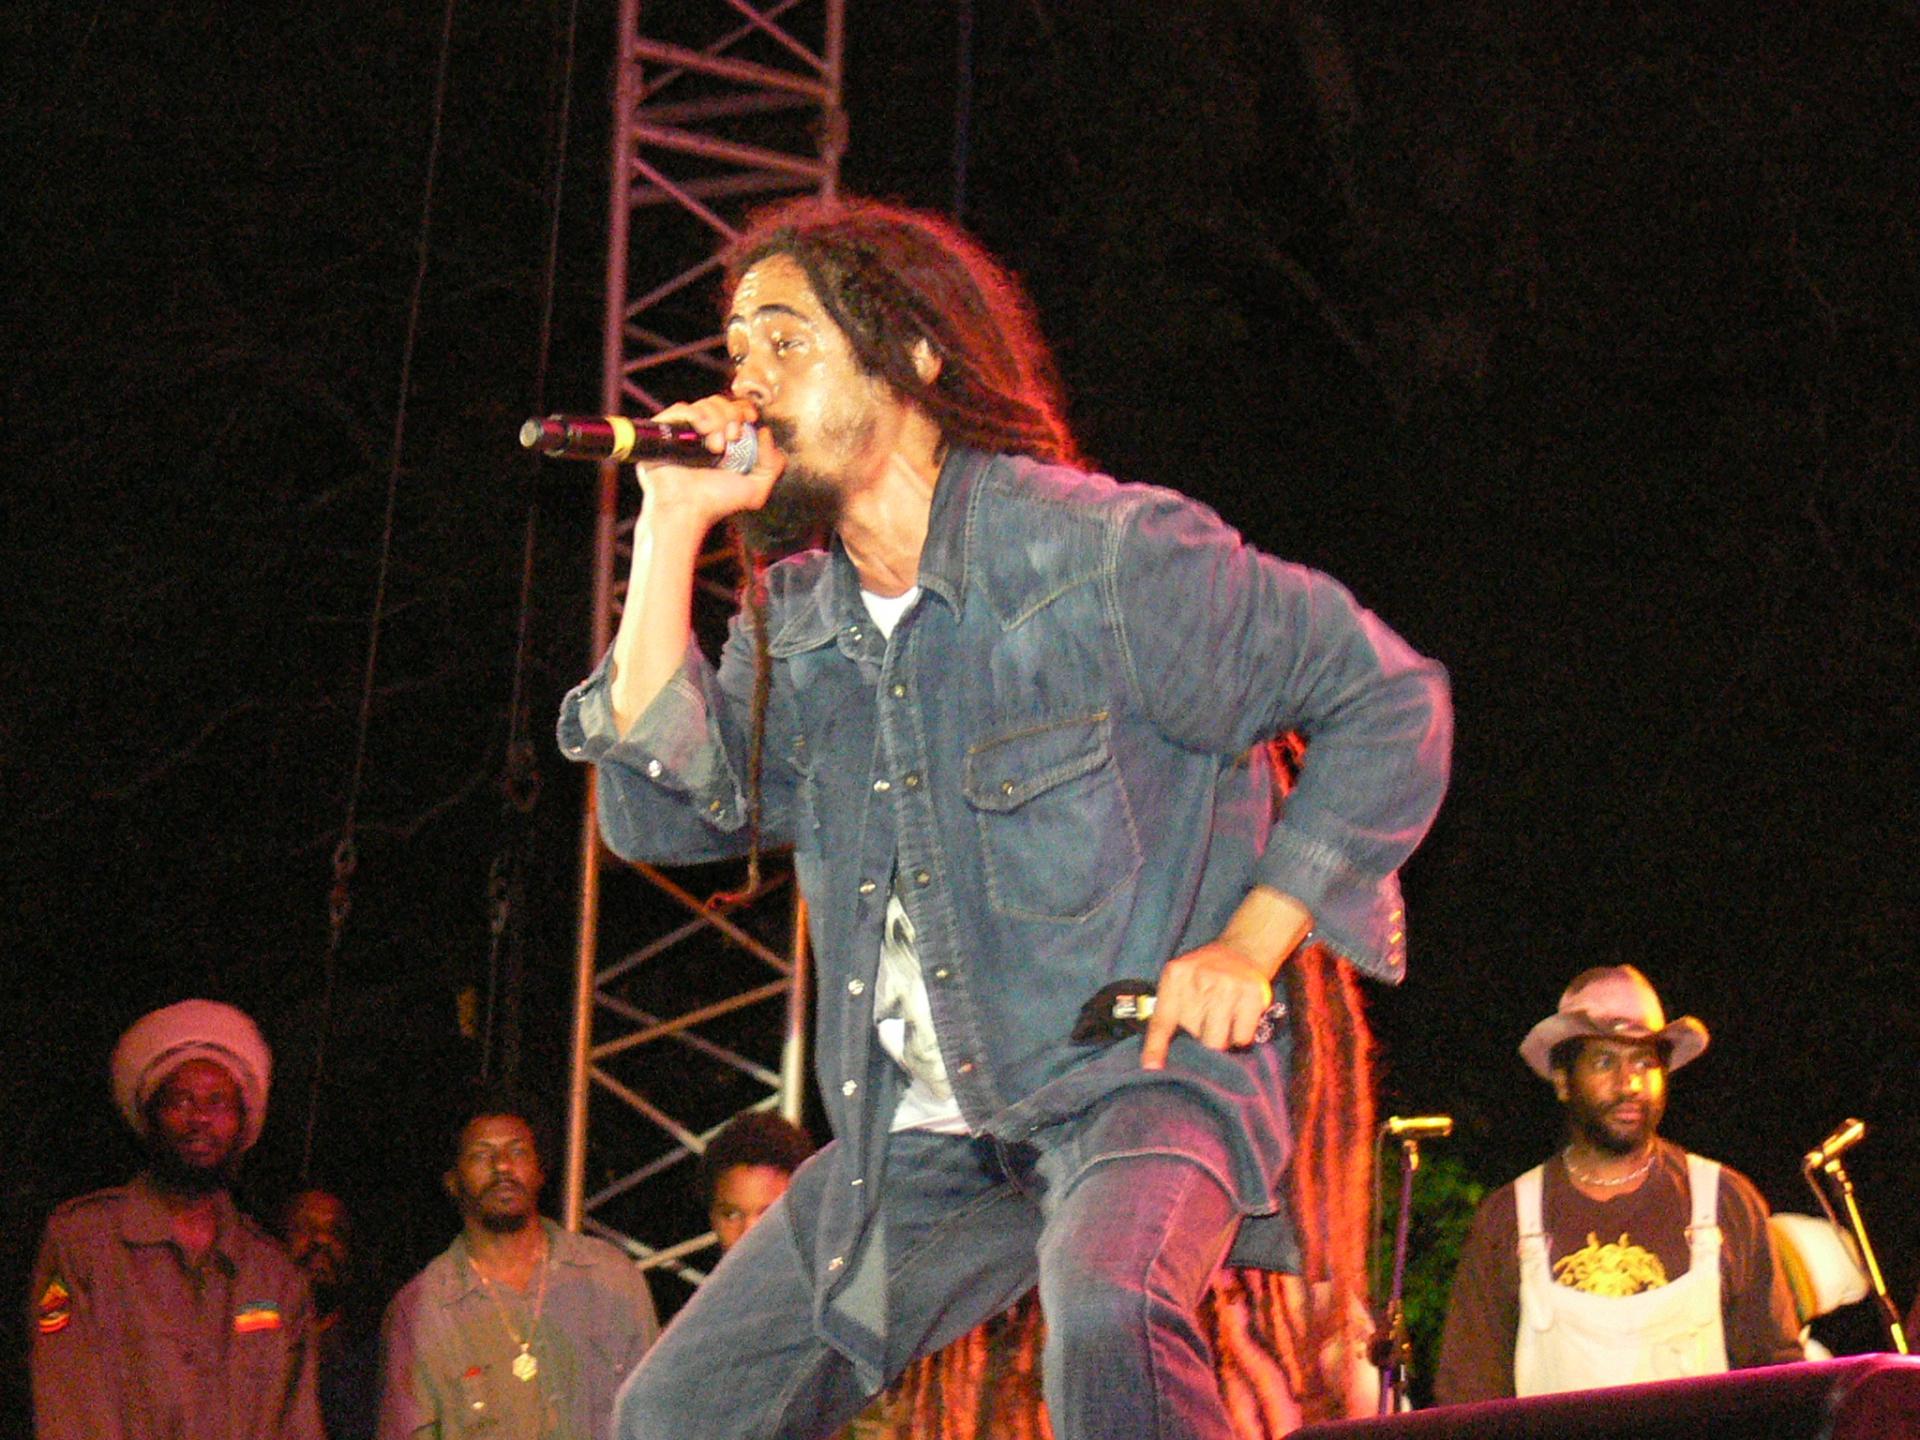 Damian marley smile jamaica 2008